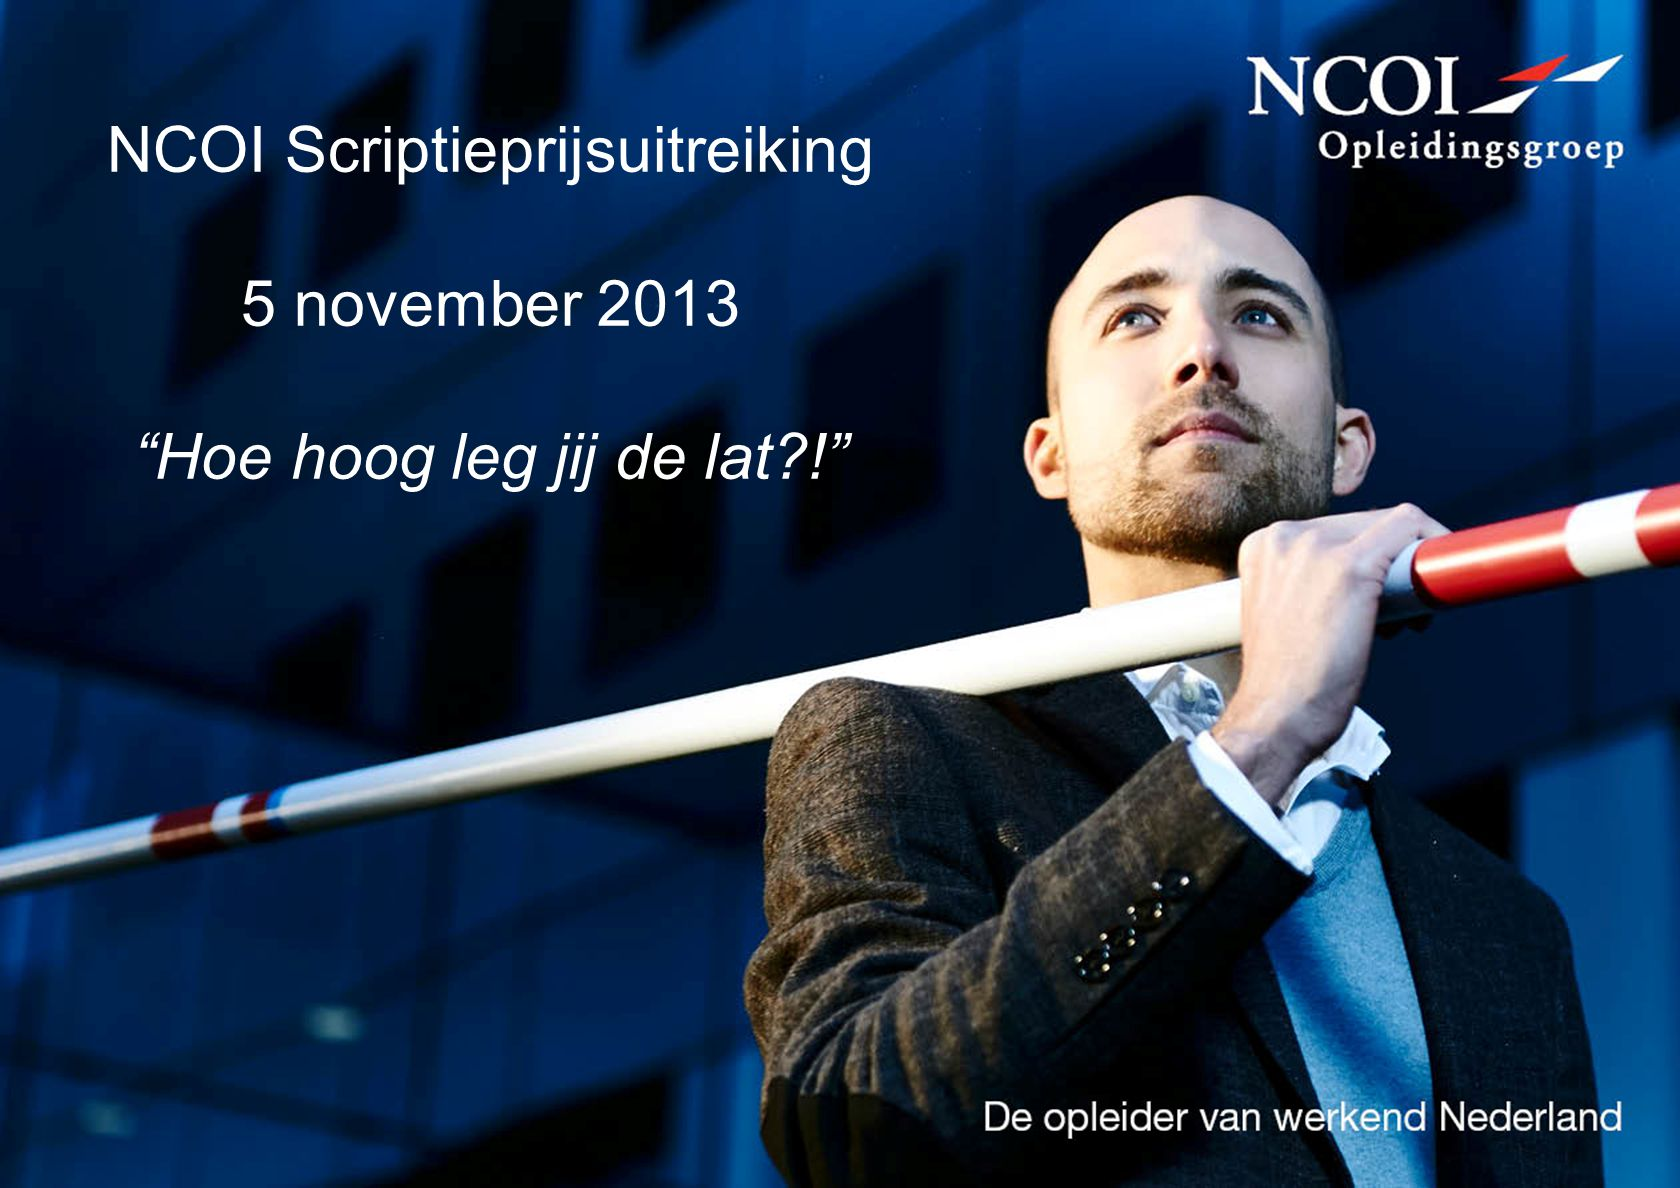 NCOI Scriptieprijsuitreiking 5 november 2013